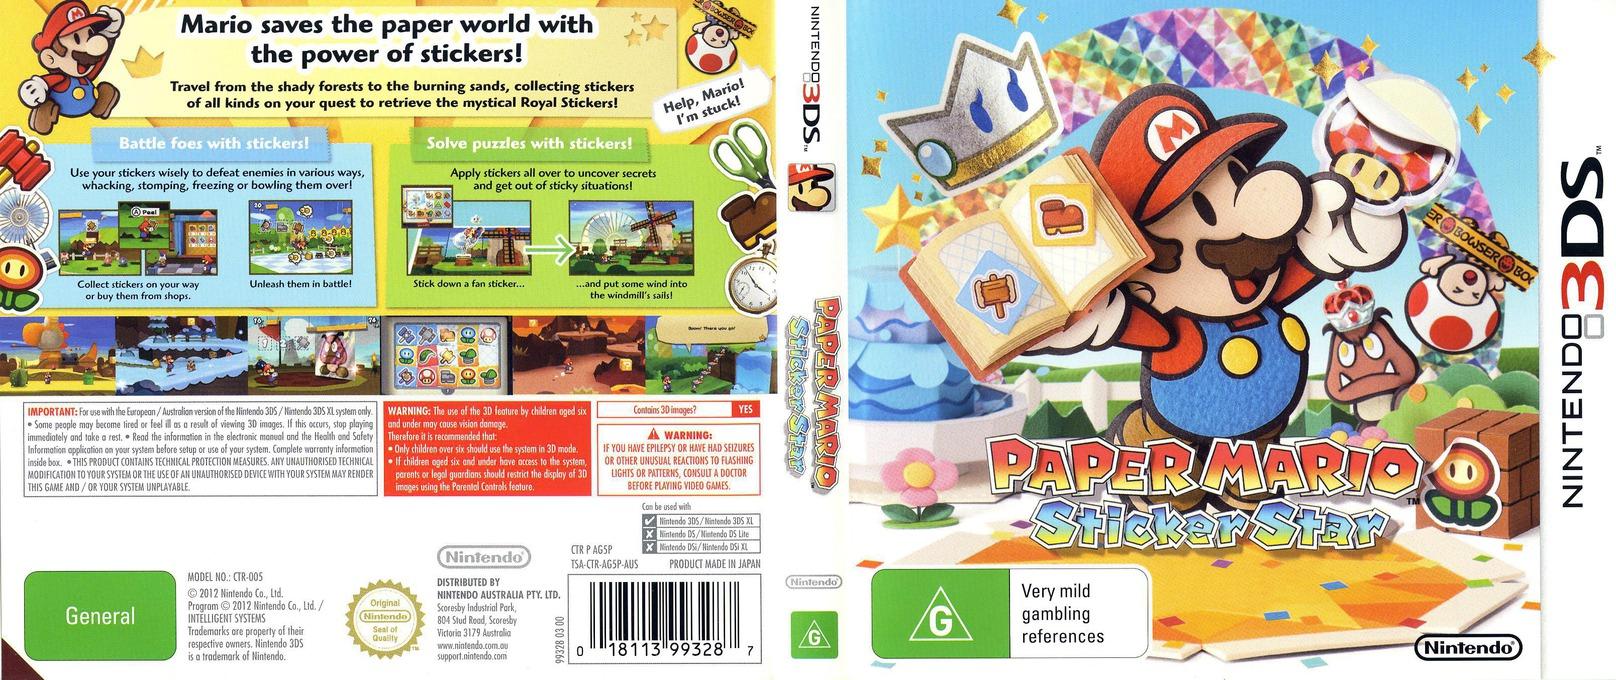 AG5P - Paper Mario - Sticker Star